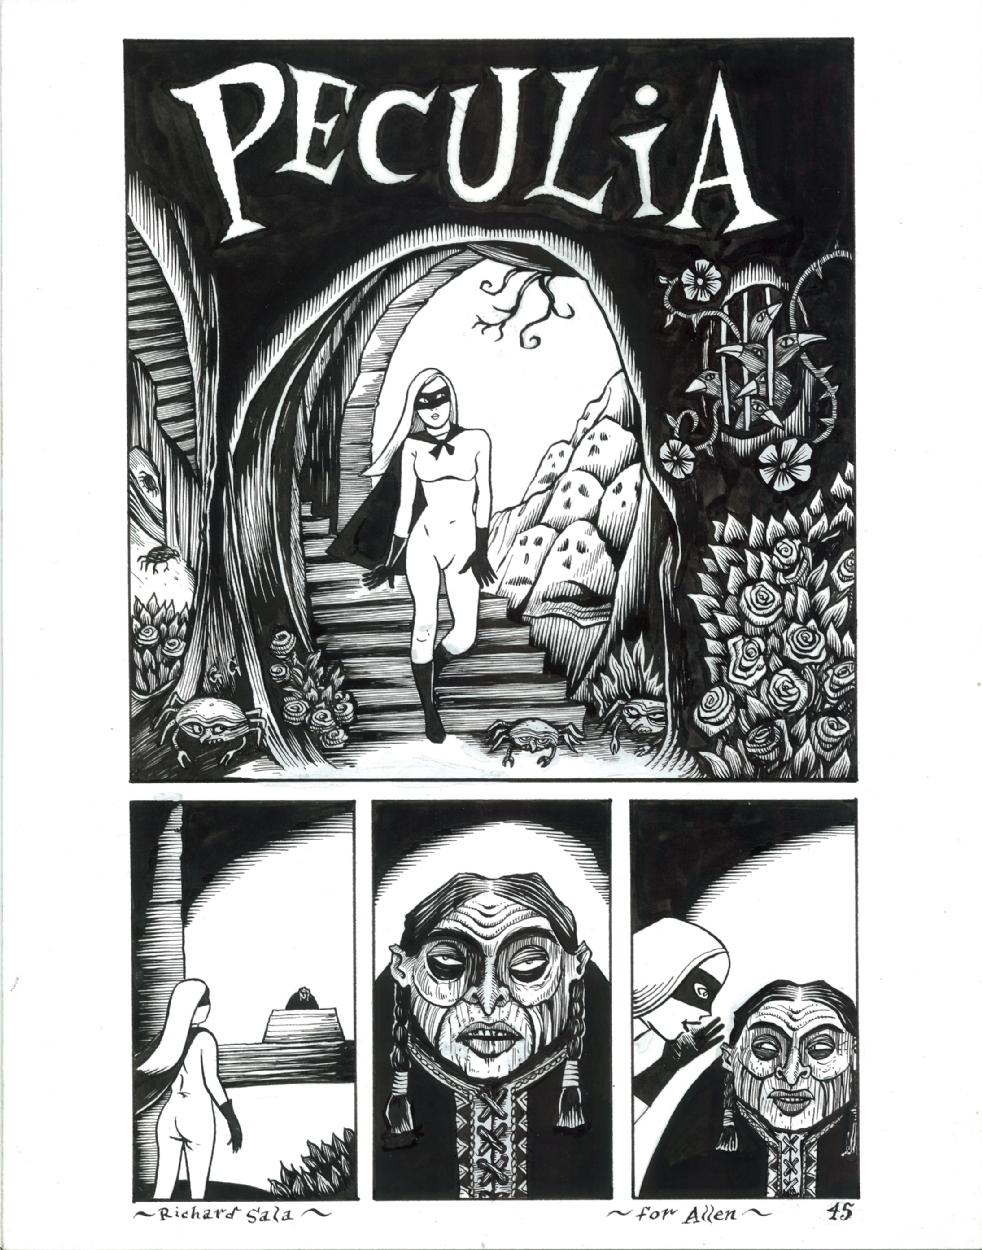 Peculia review